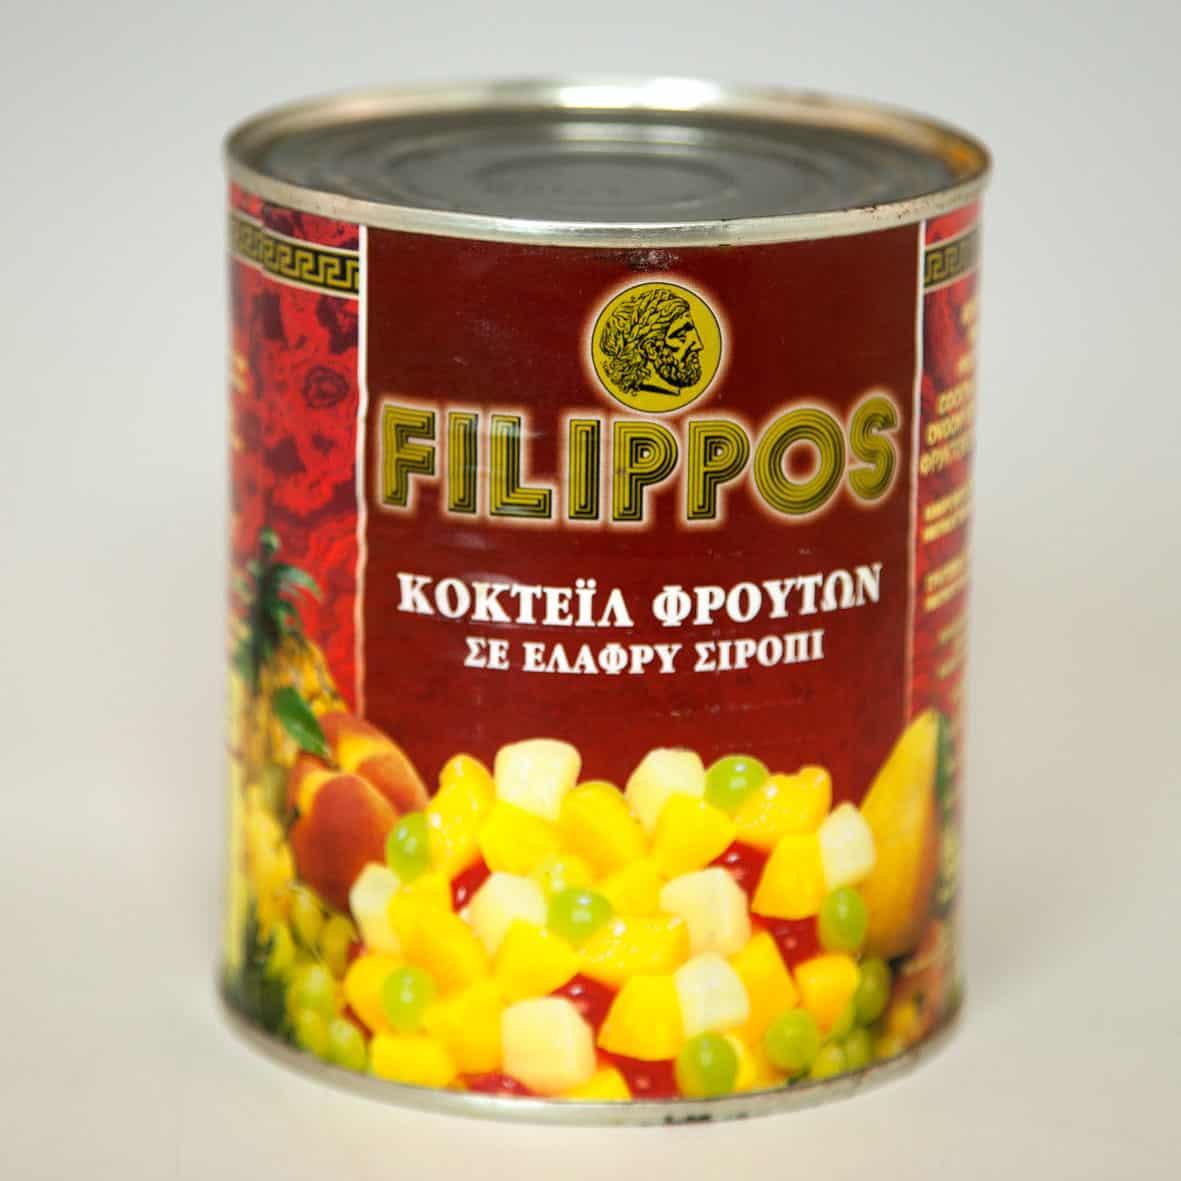 Filipos Kompot Voćni mix 850ml